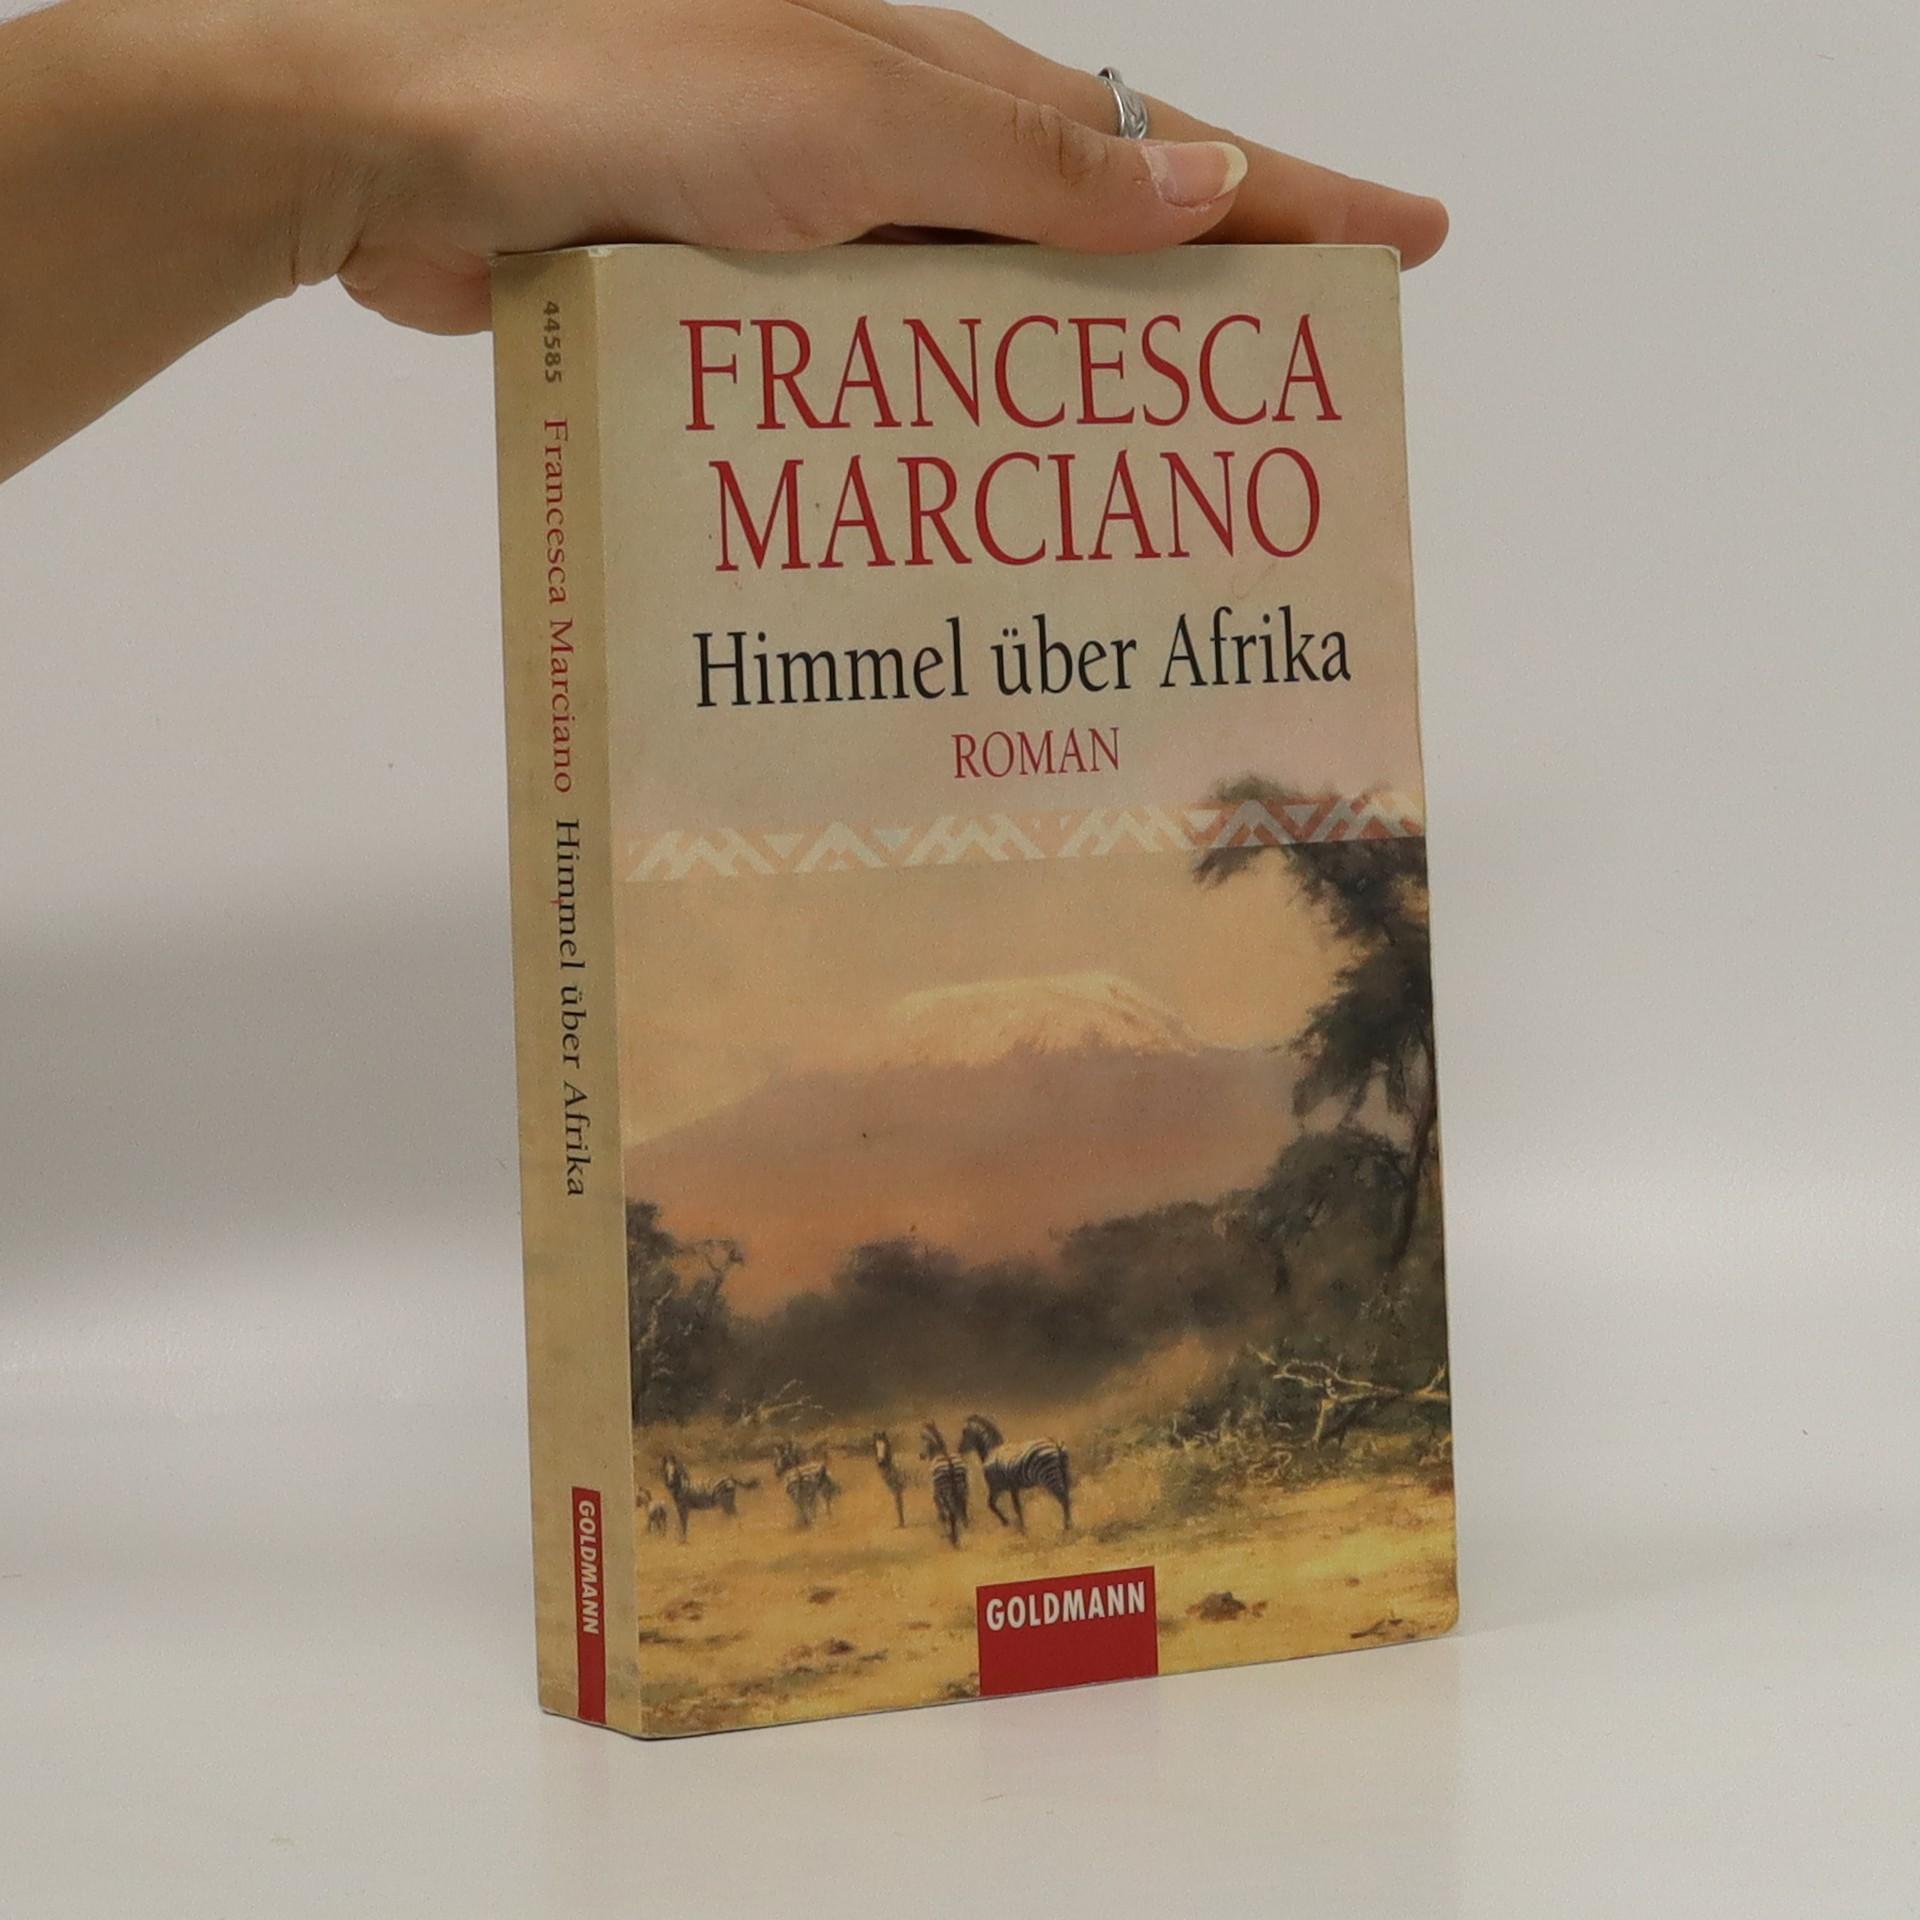 antikvární kniha Himmel über Afrika, neuveden